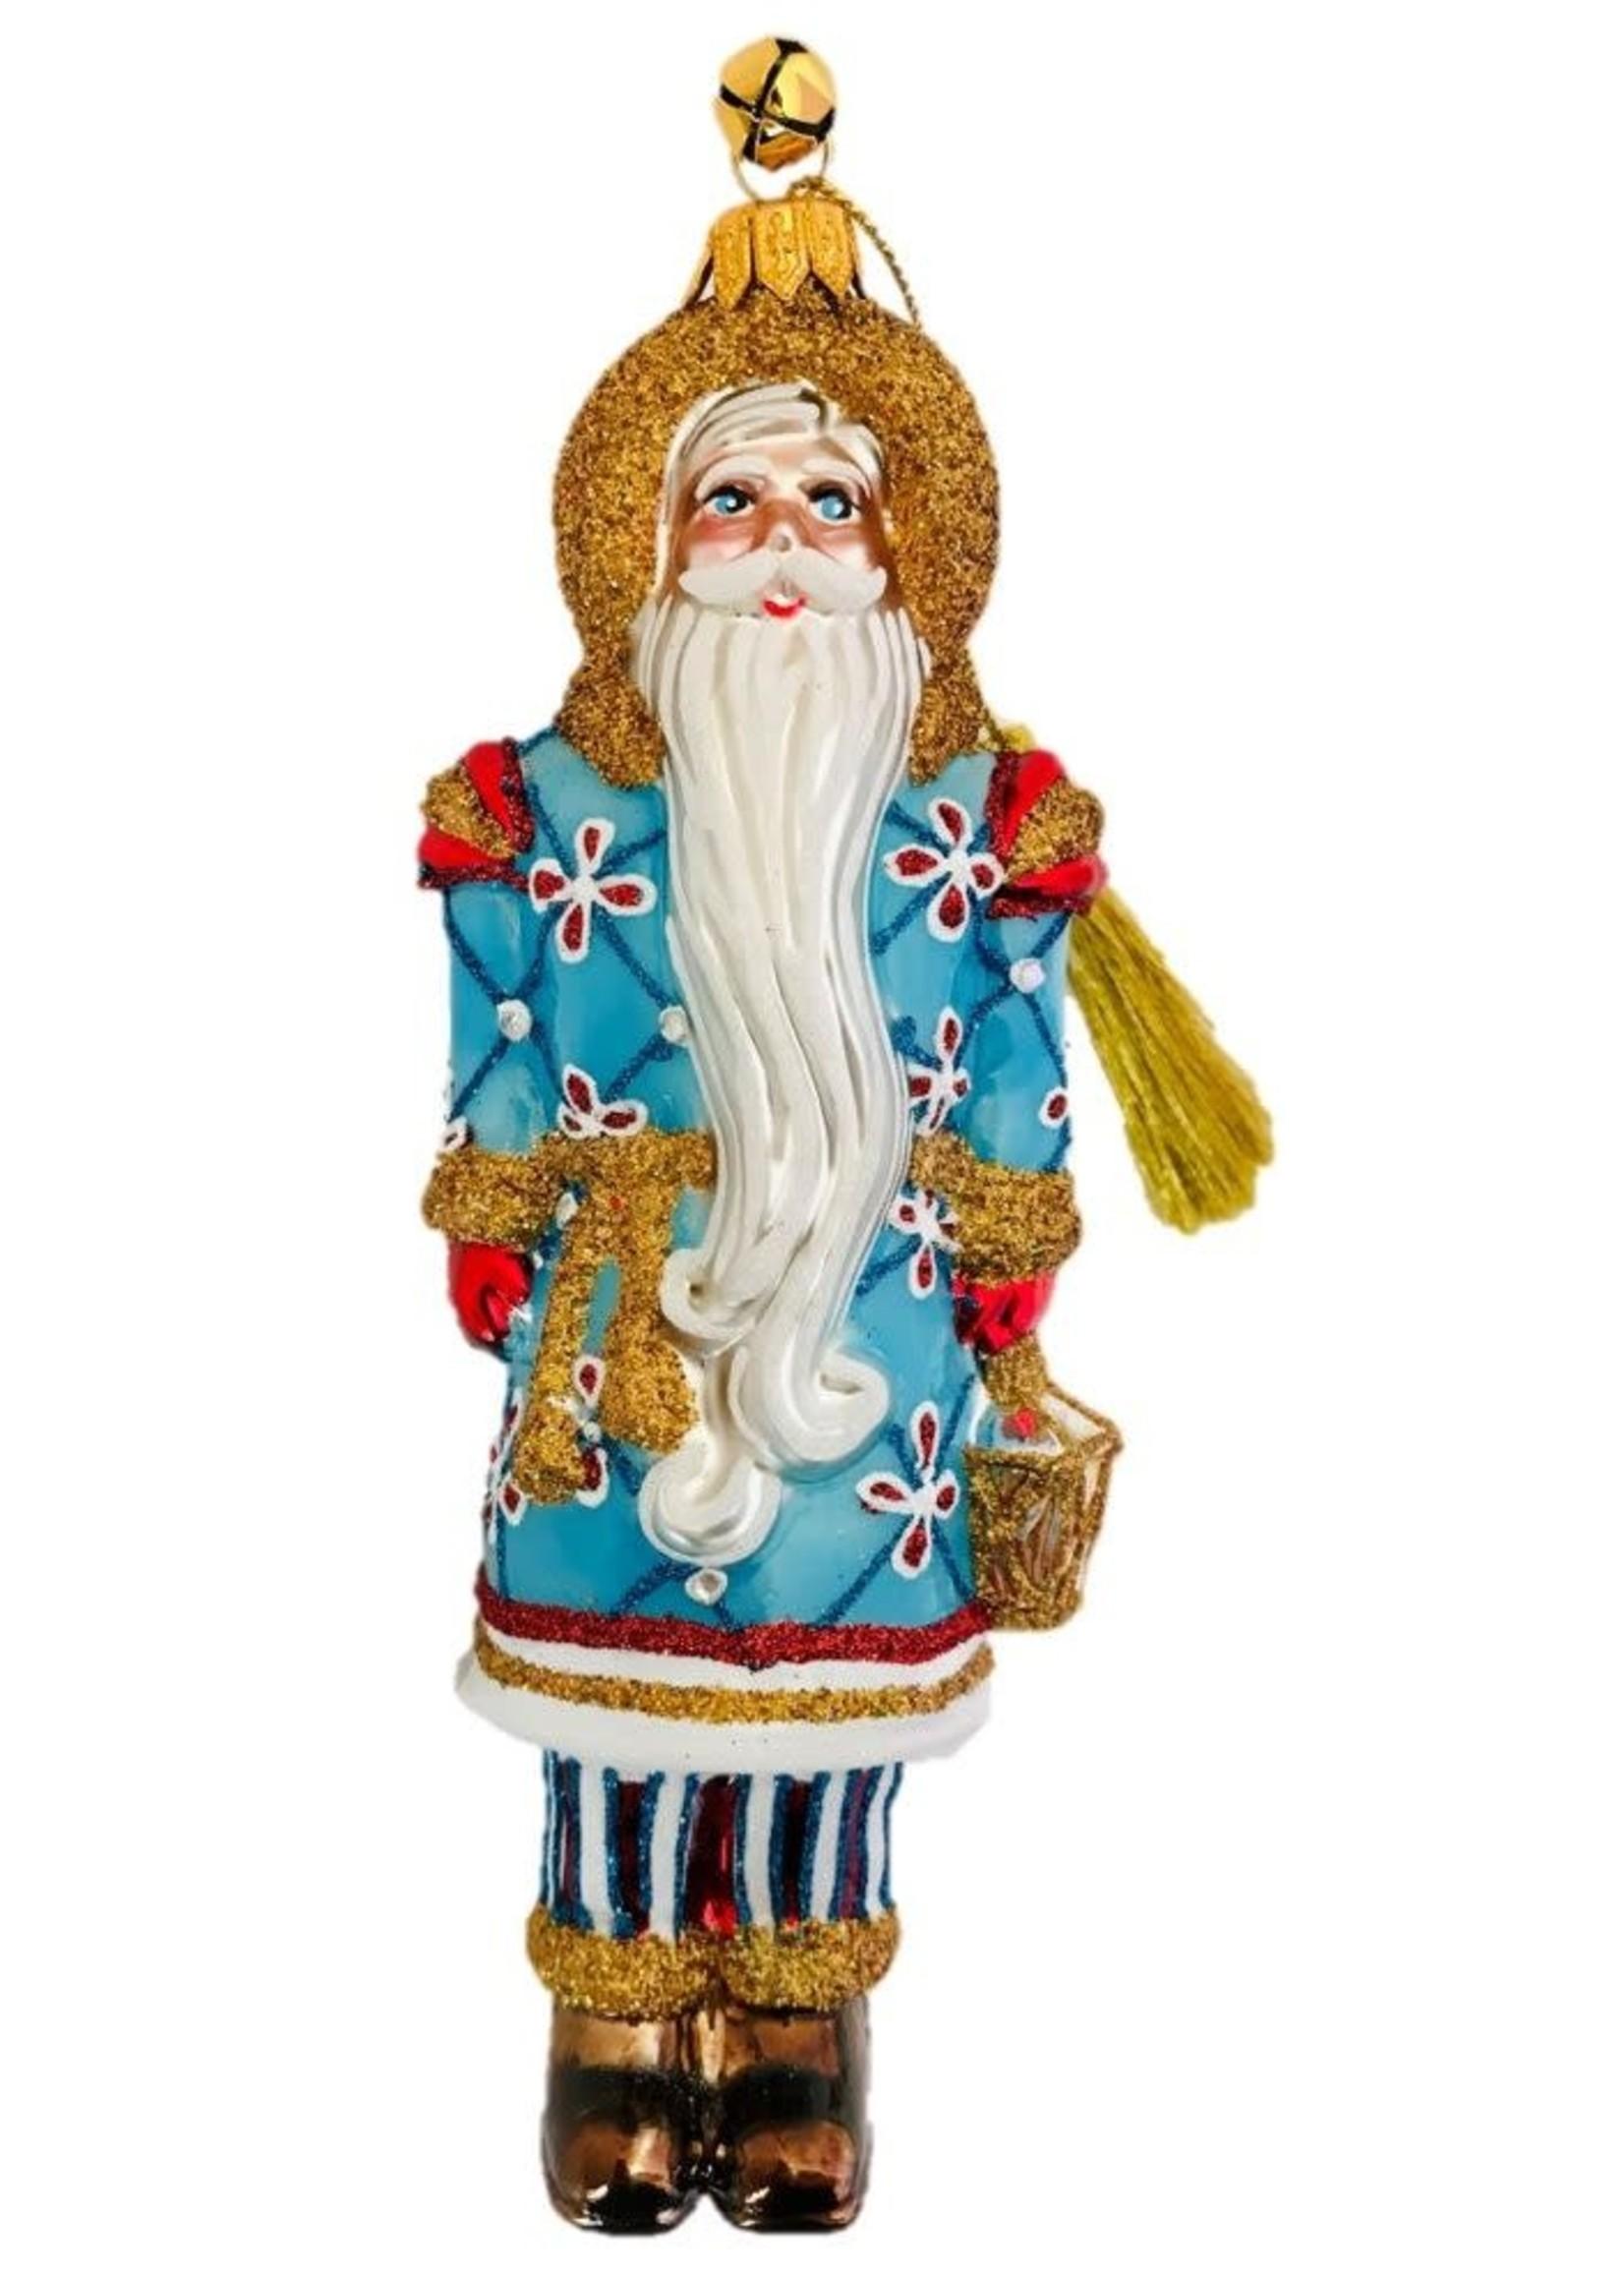 Jingle Nog Ornament - Papa Holiday